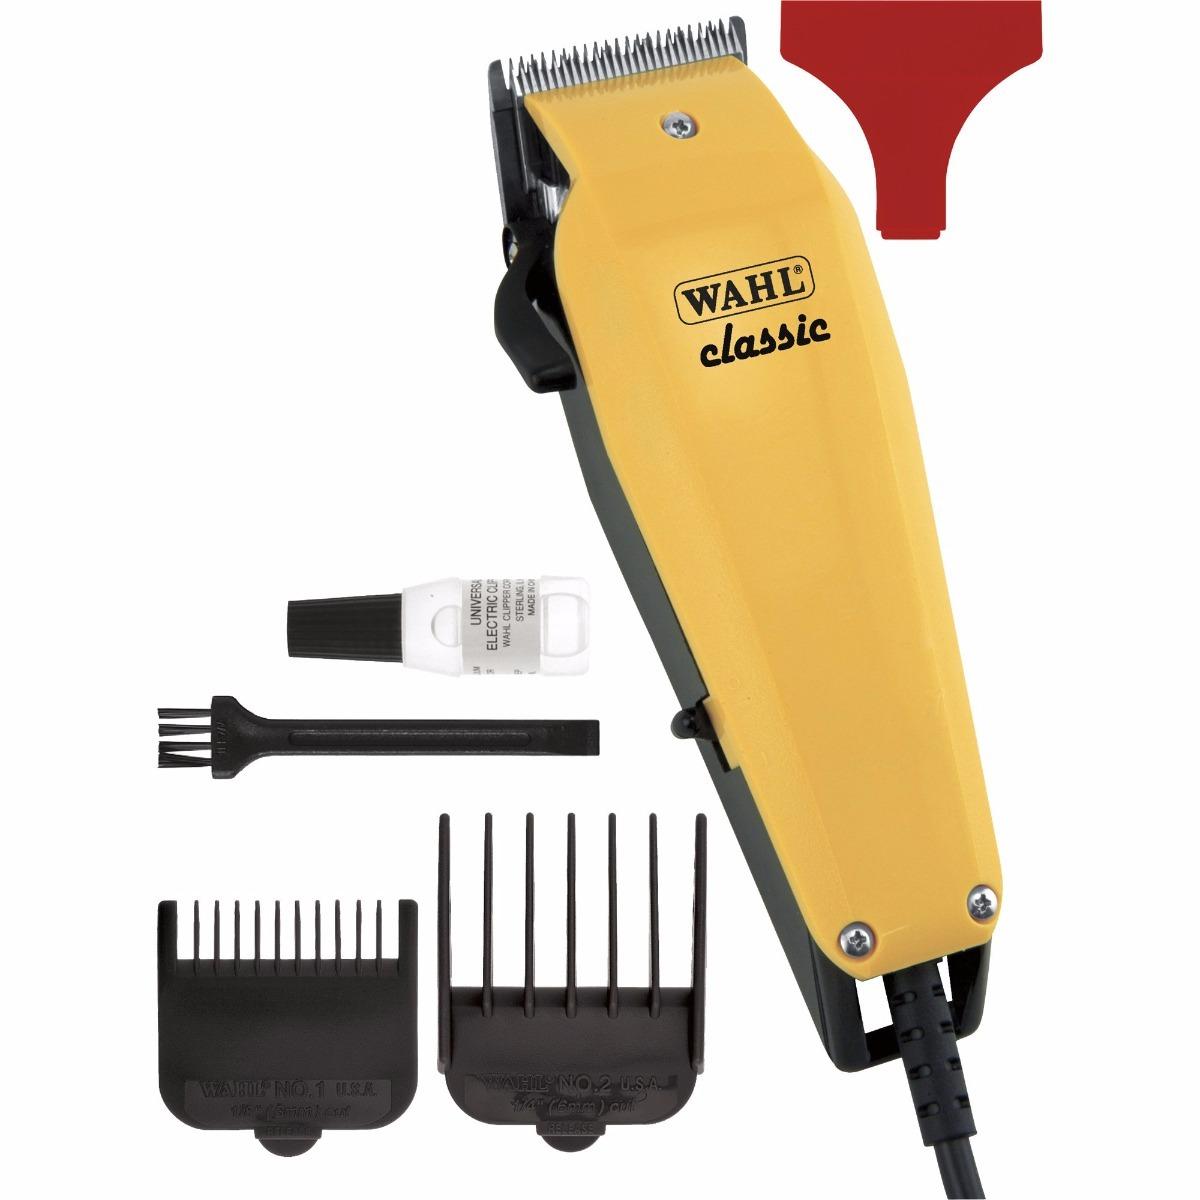 ec09f2601 máquina de cortar cabelo wahl brasil classic 127v amarela. Carregando zoom.